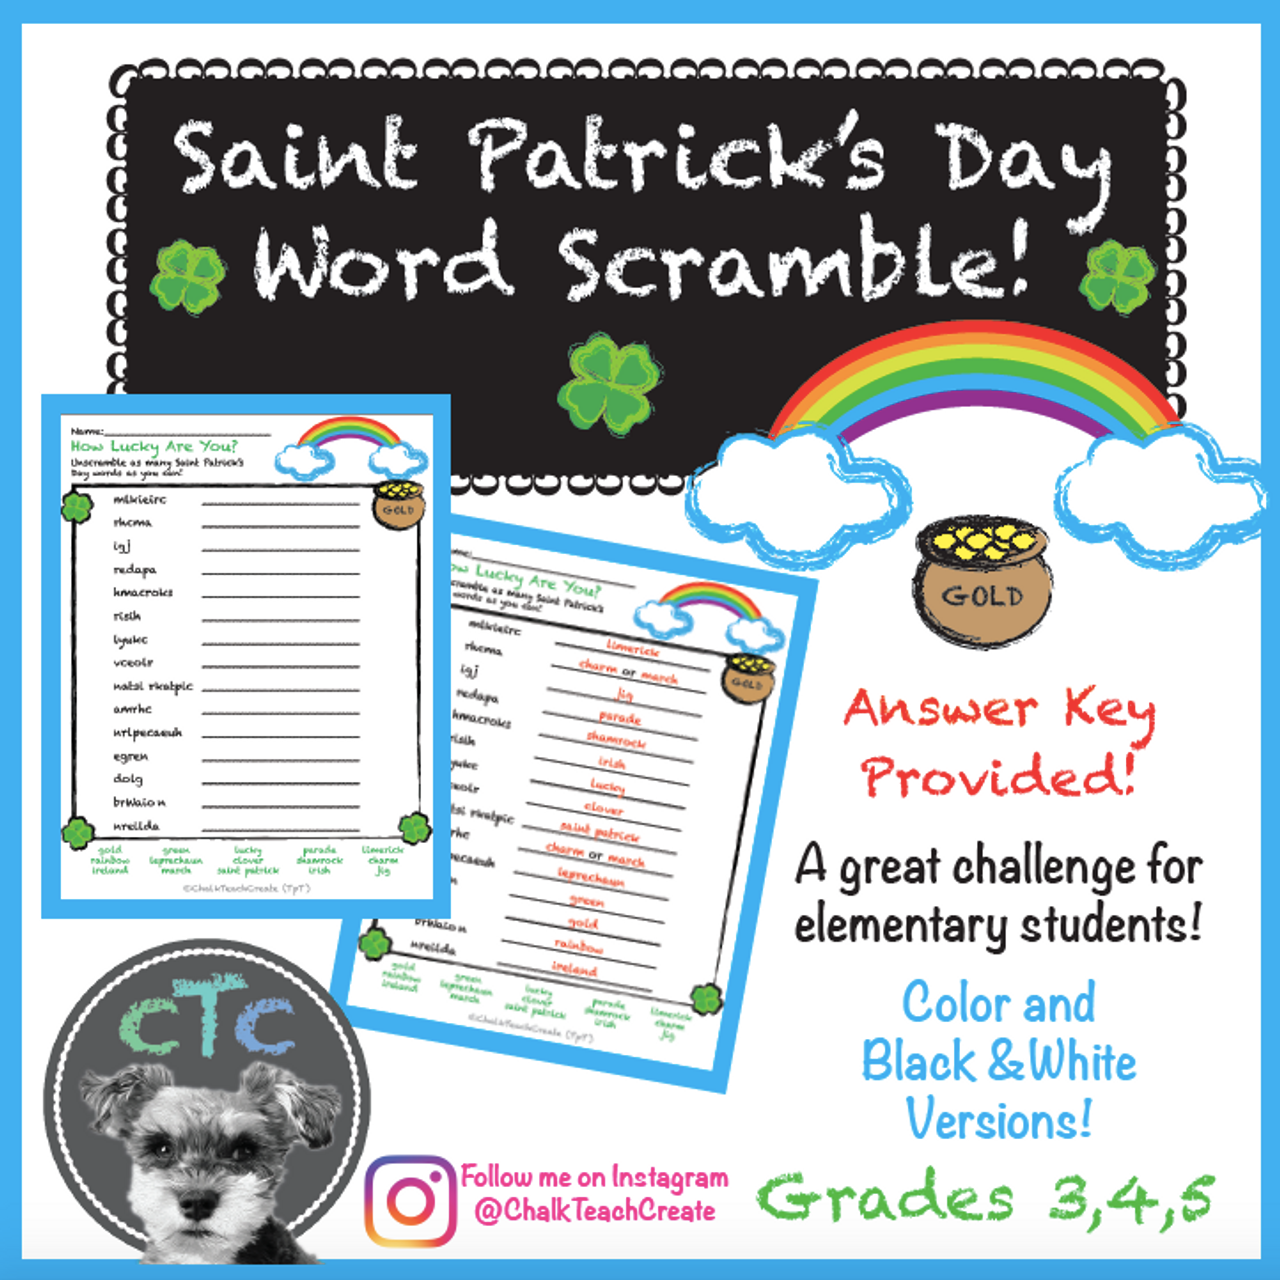 St. Patrick's Day Word Scramble!